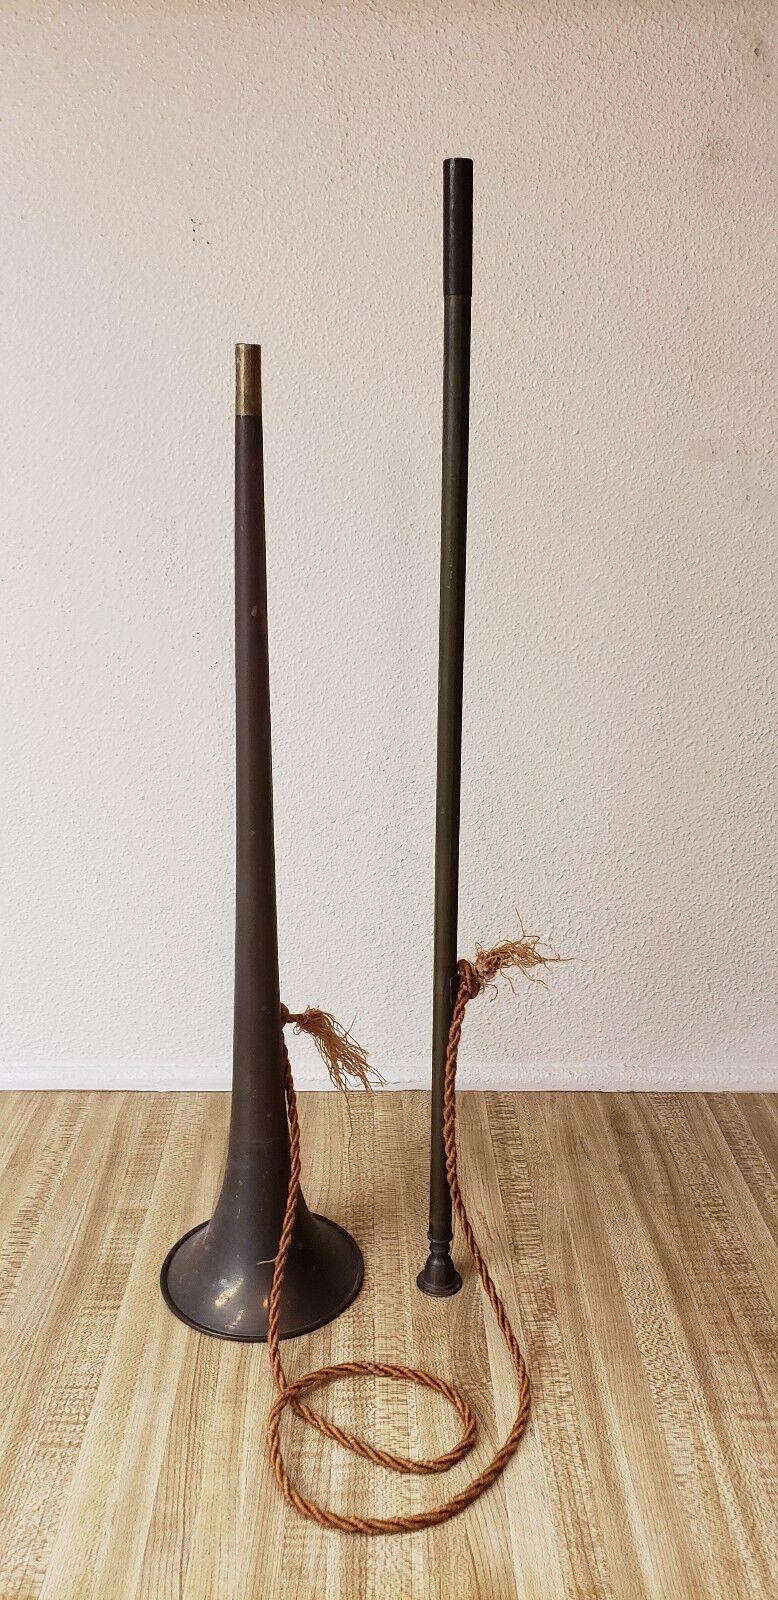 Vintage Copper & Brass 2 Piece Fox Hunting Horn Equestrian Bugle Trumpet 39.5